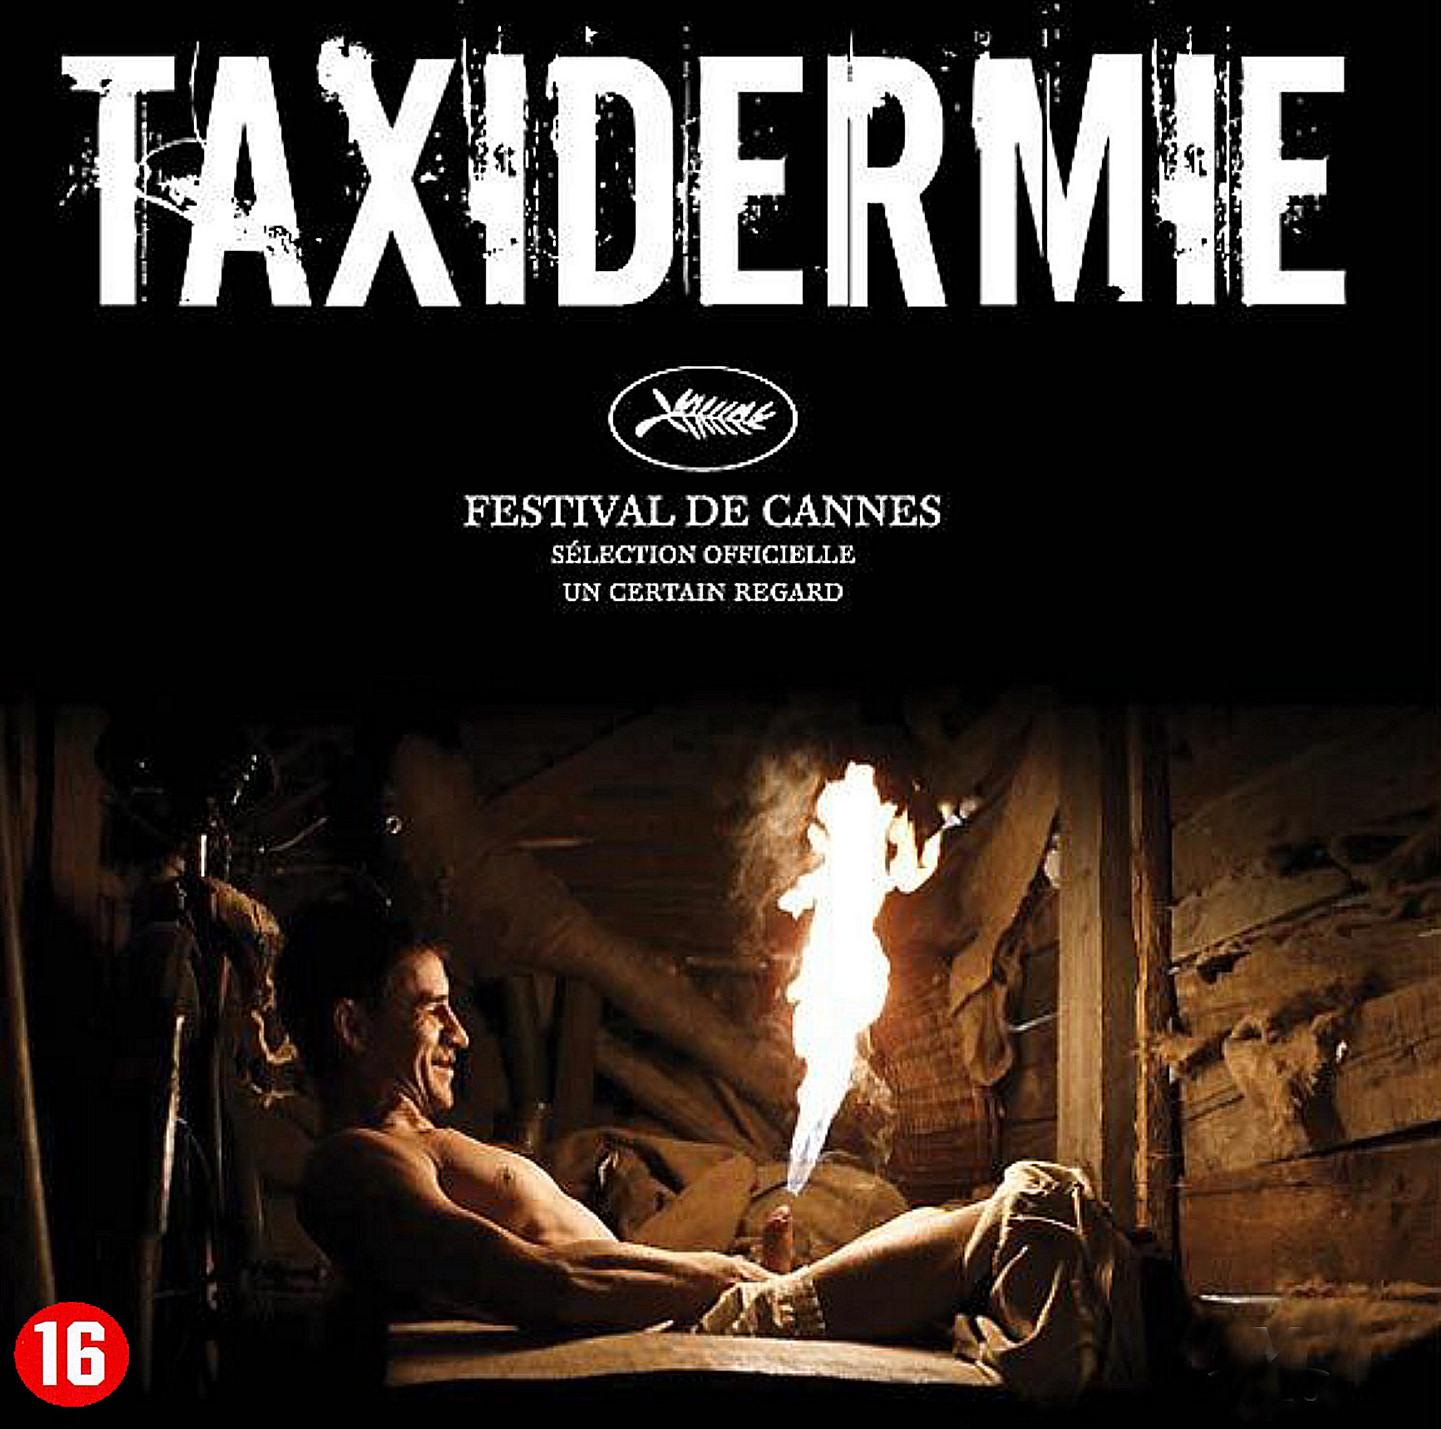 taxidermie movie